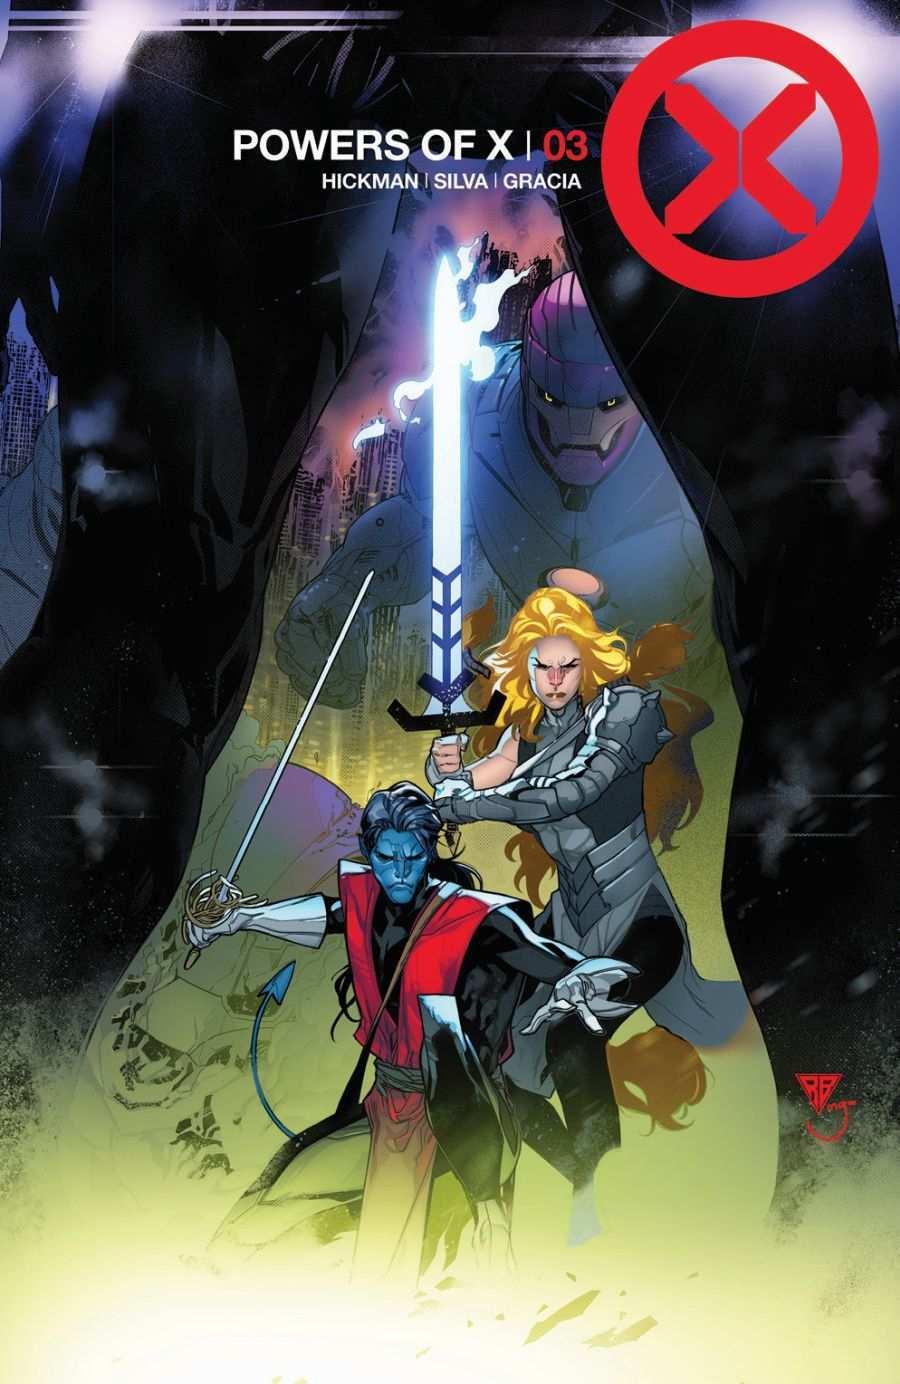 Os X-Men de Jonathan Hickman - Powers of X #3 - Blog Farofeiros